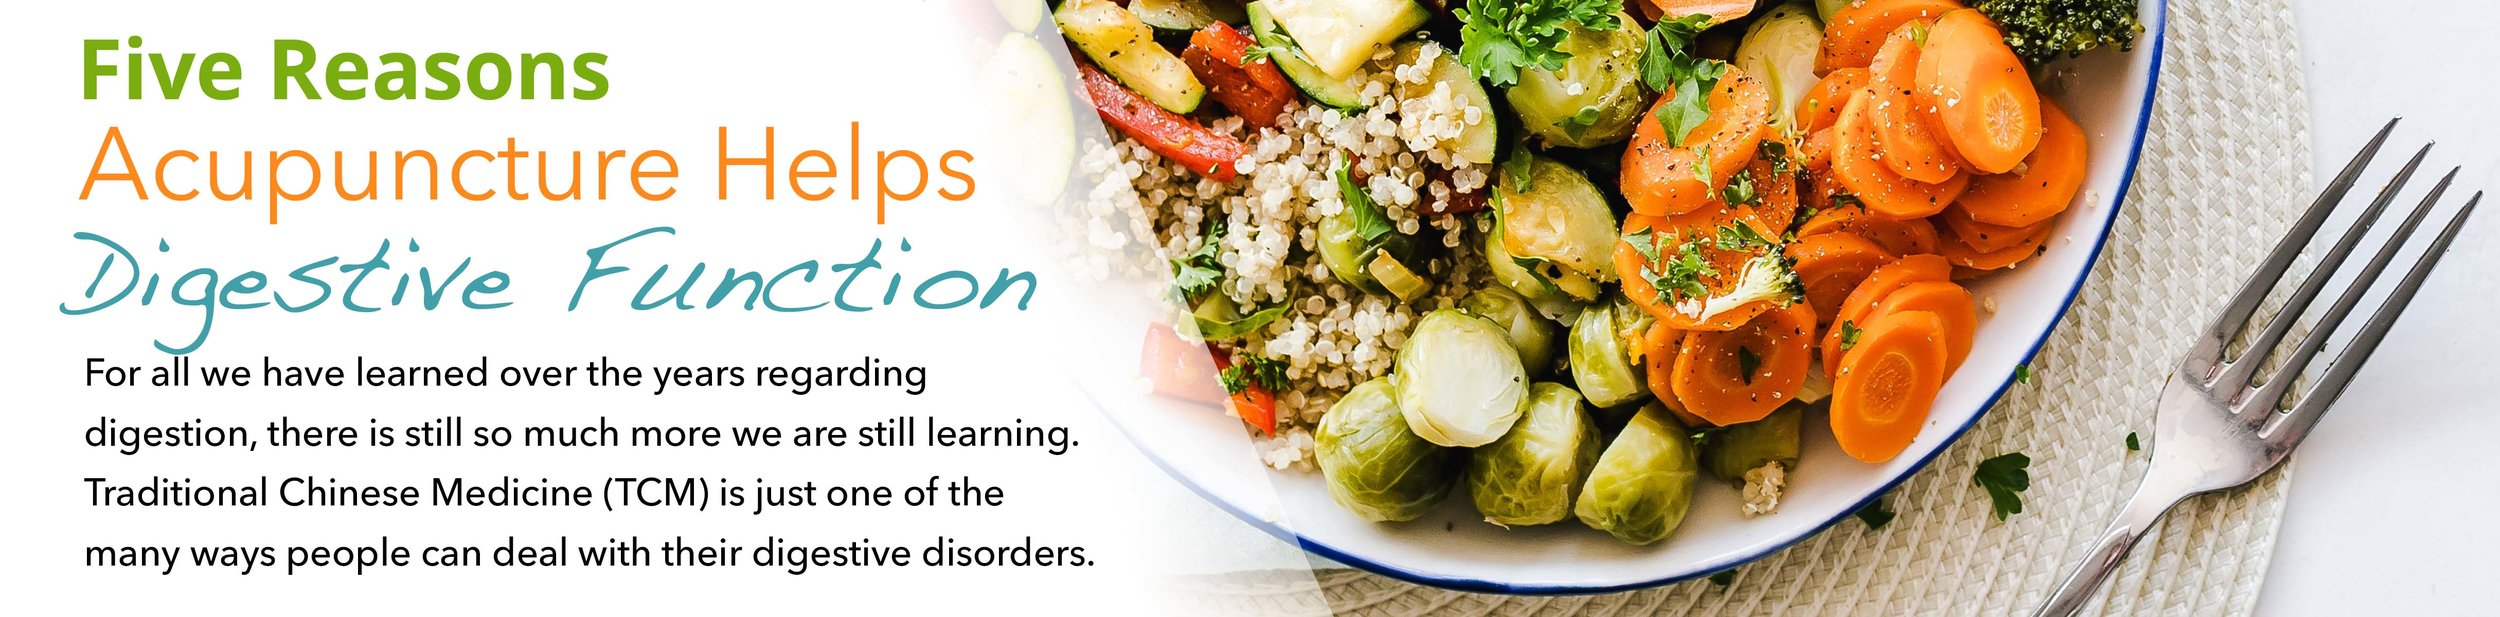 Blog2_Five Reasons Acupuncture Helps Digestive Function.jpg